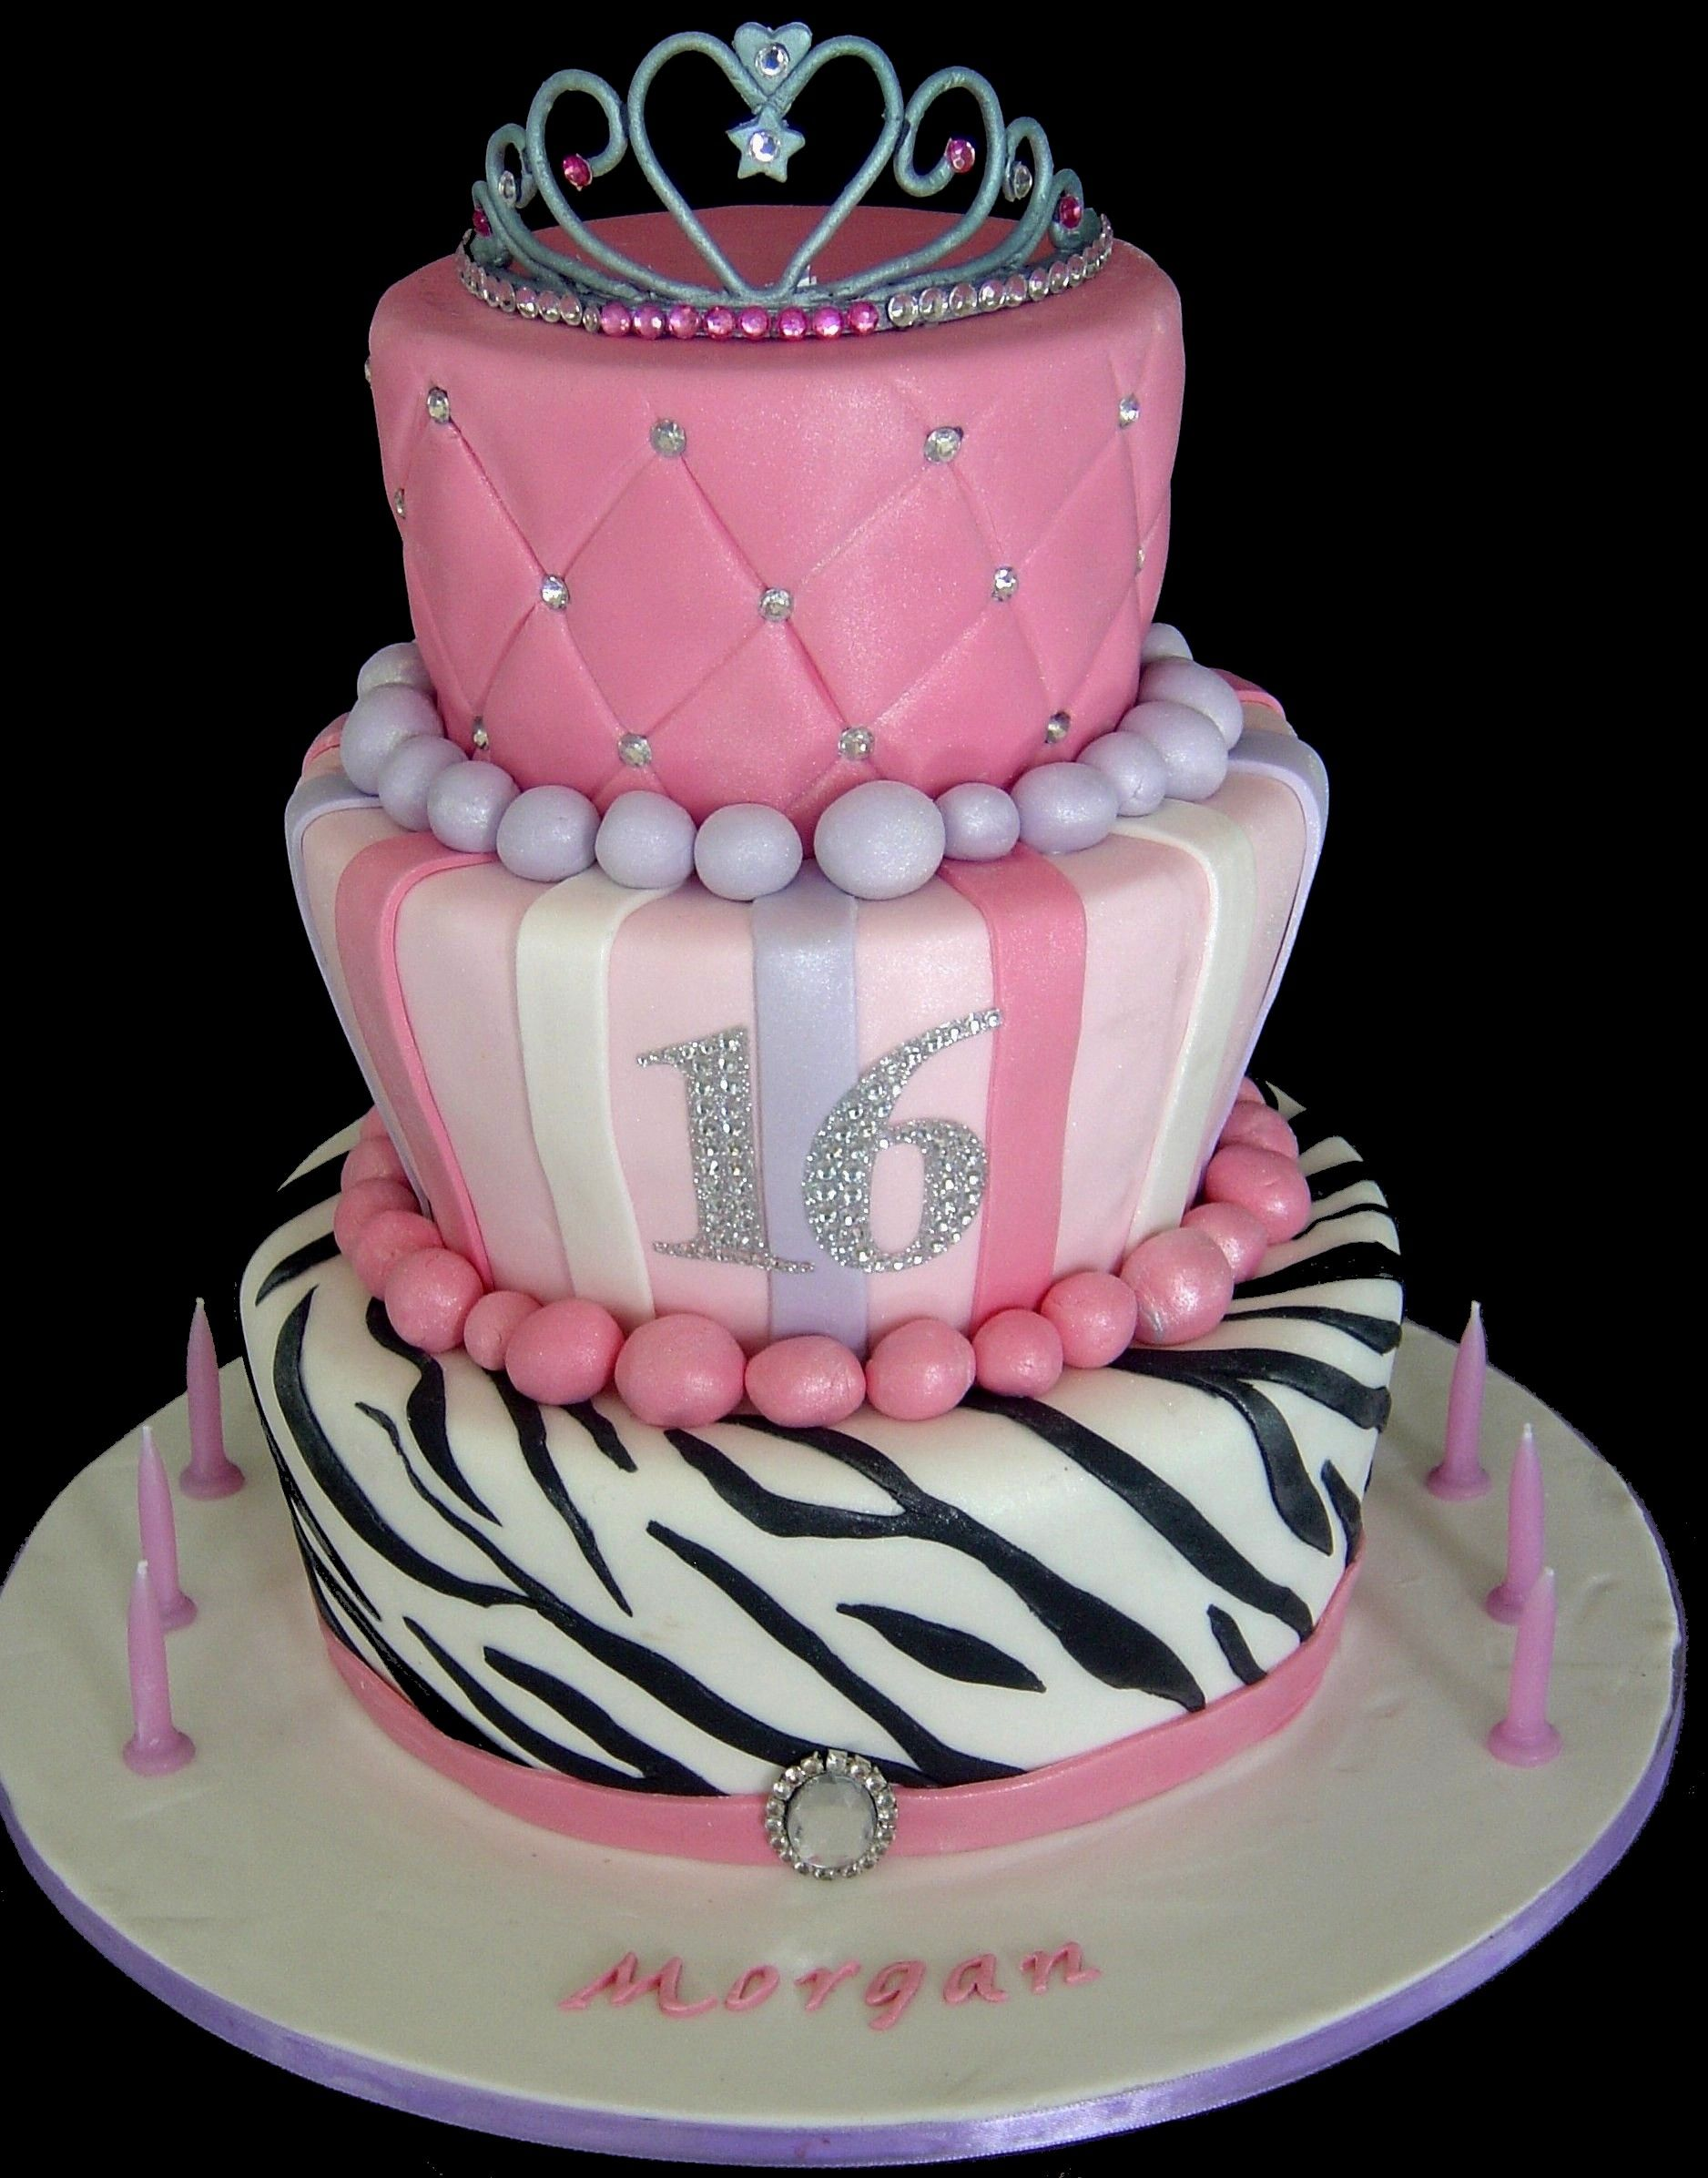 16th birthday cake la quinceanera 16th birthday cake